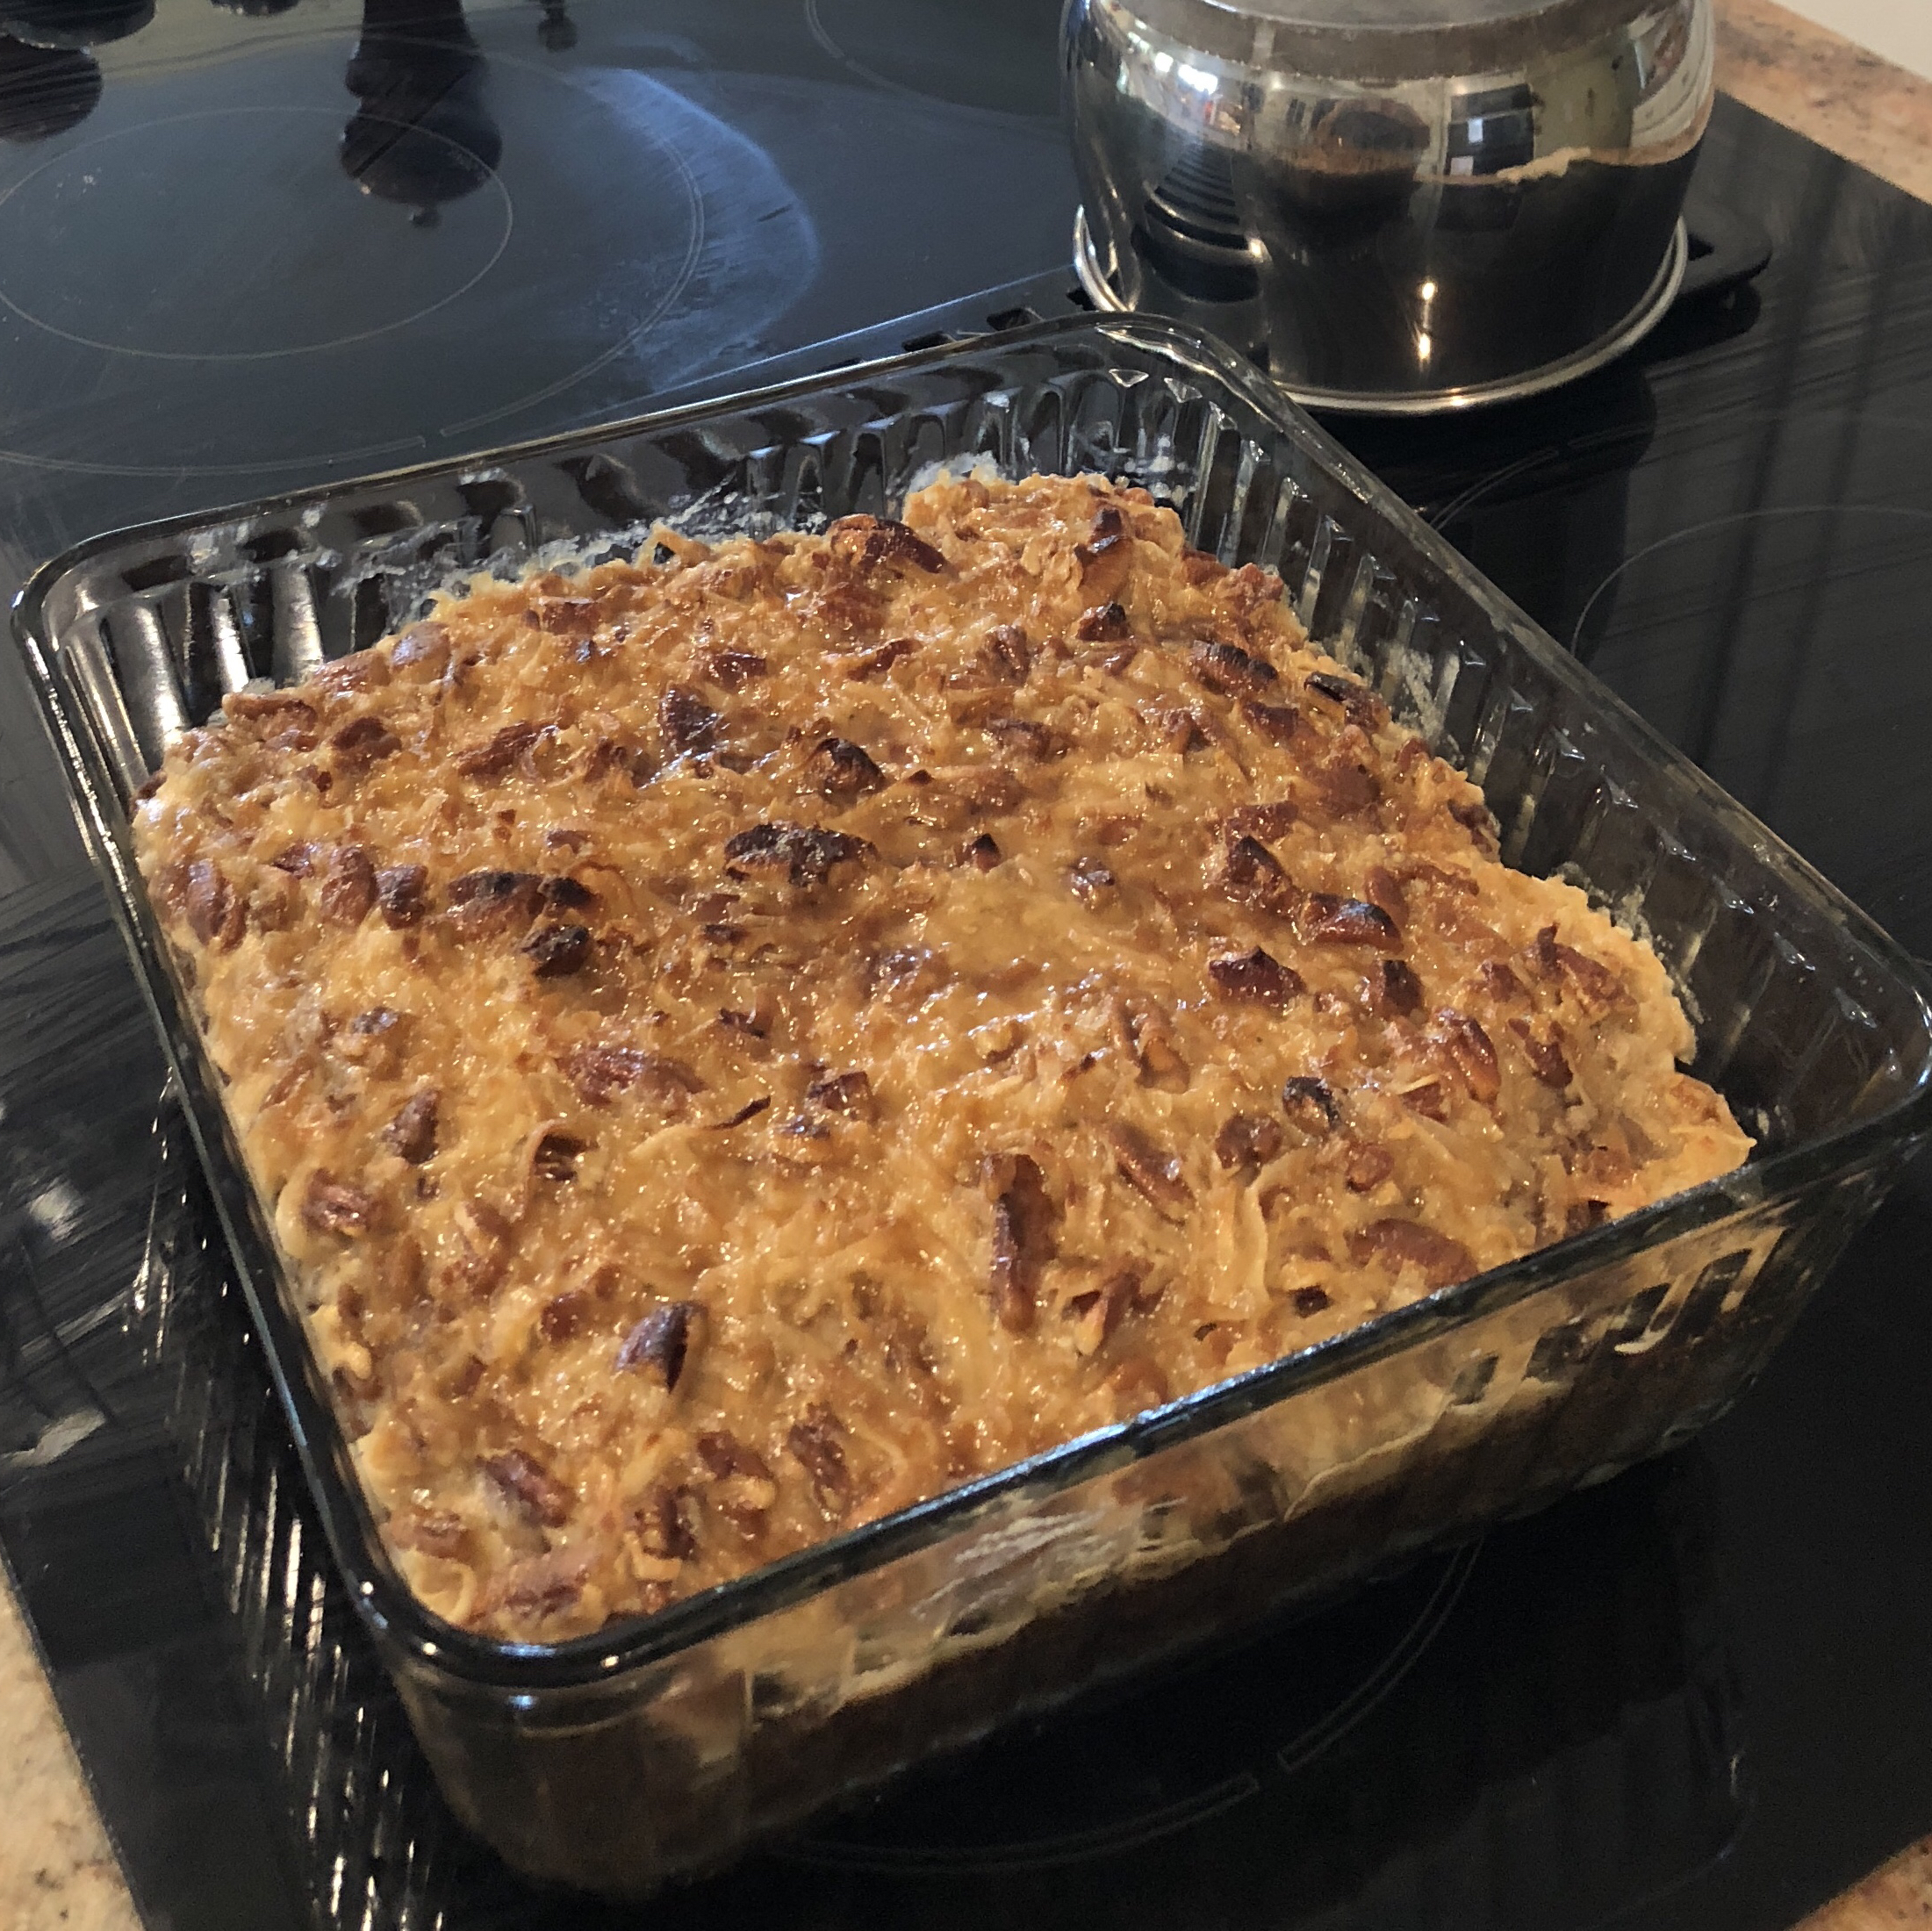 Sara Jane's Oatmeal Cake